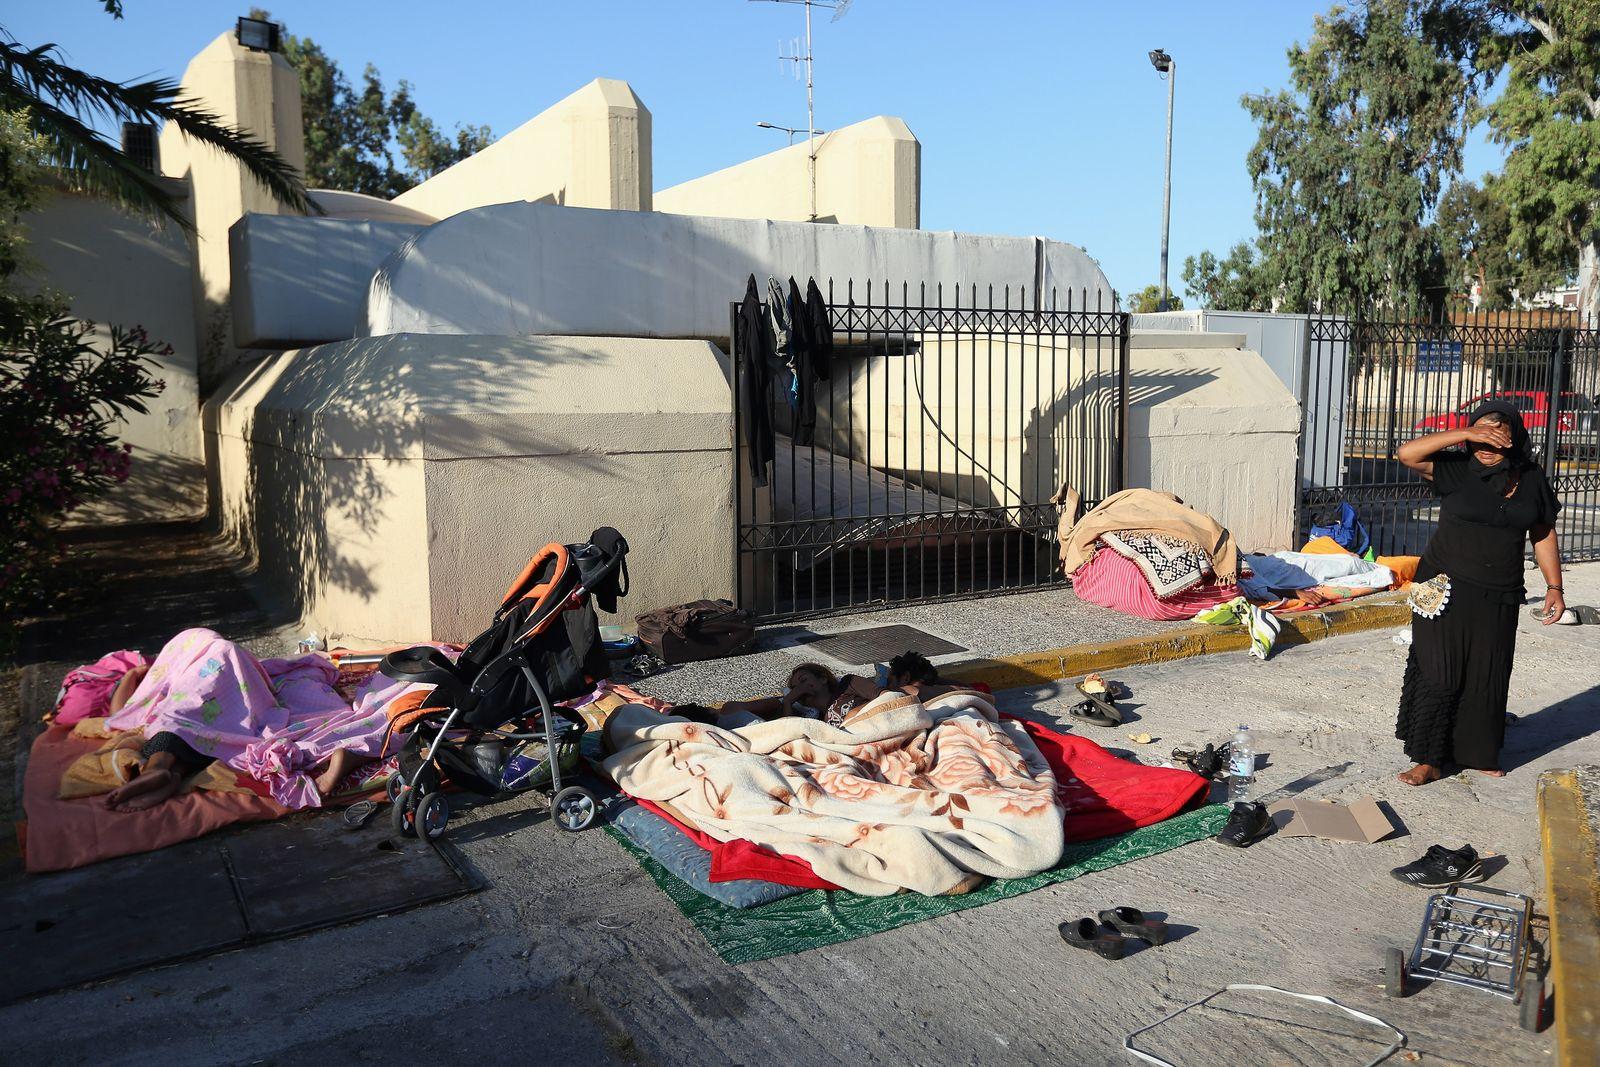 Griechenland/ Krise/ Obdachlose